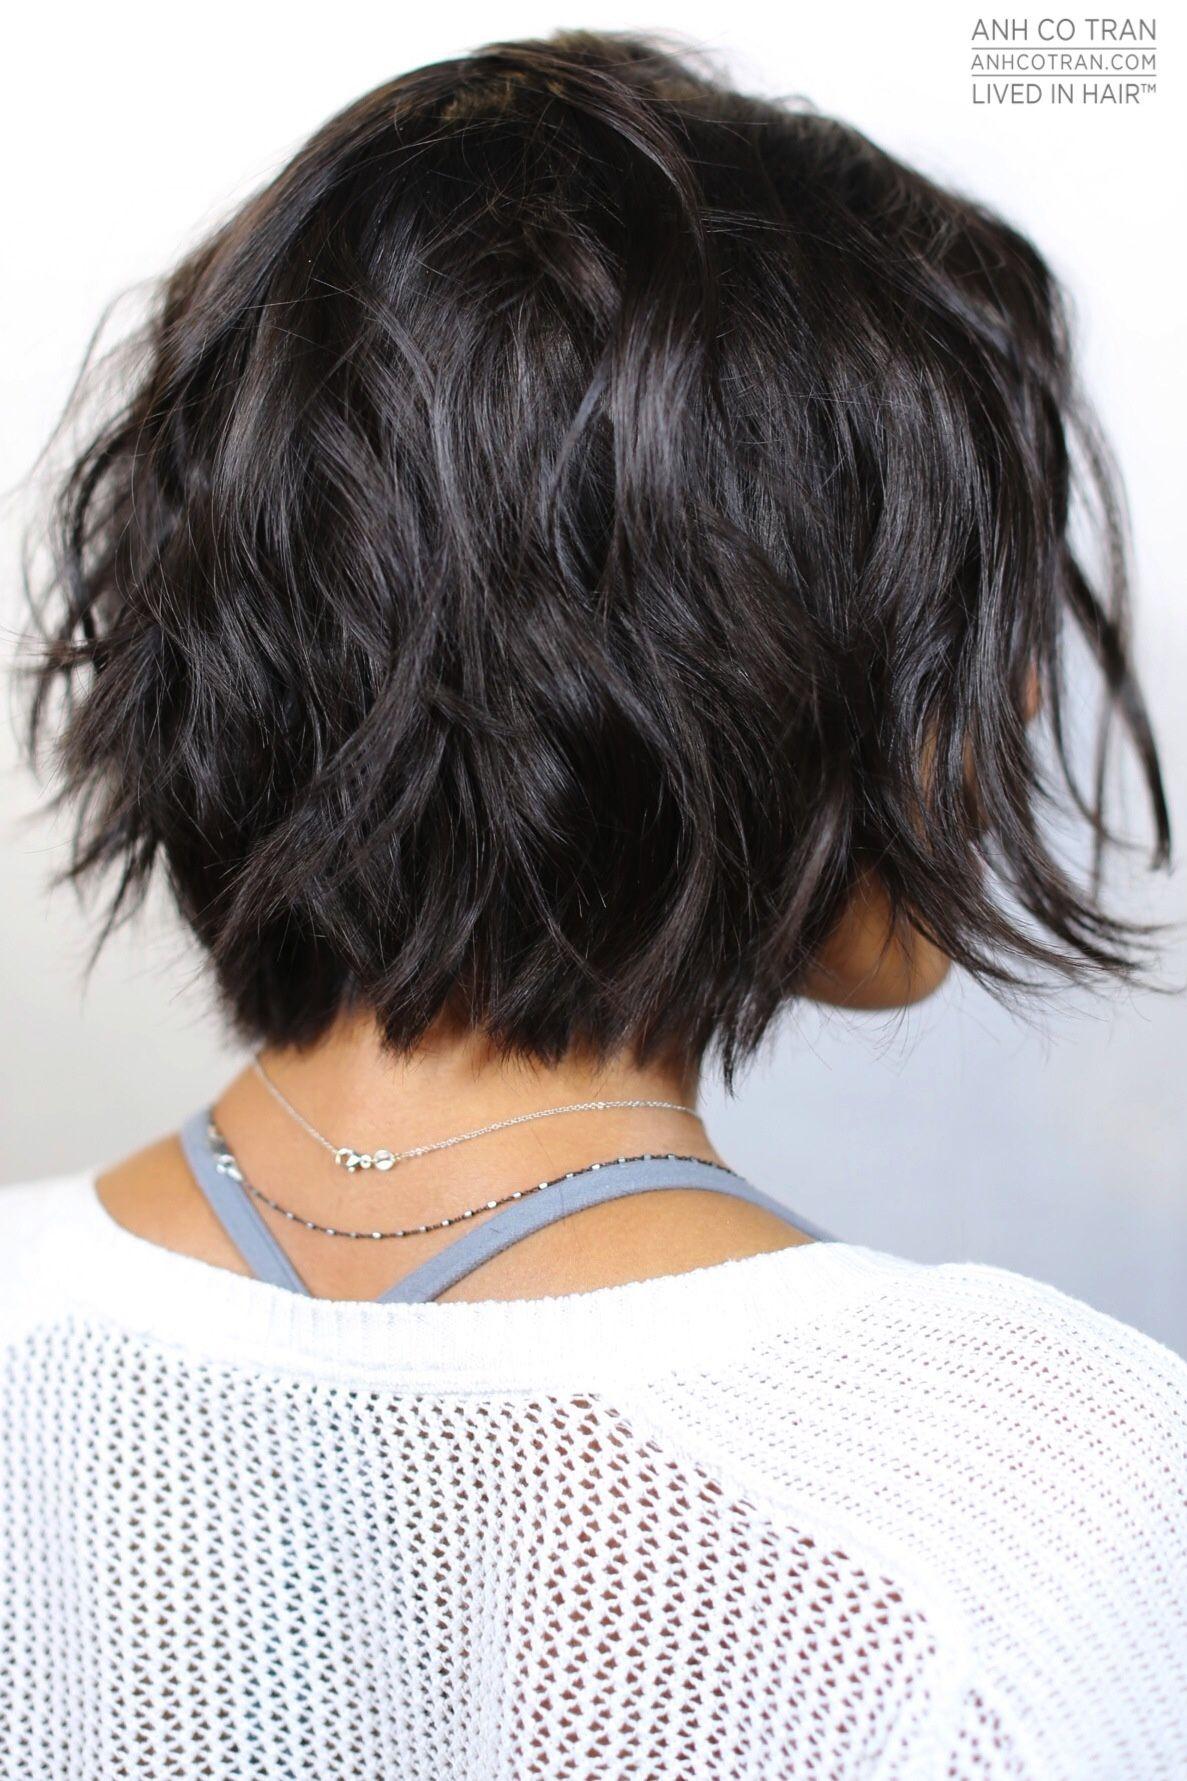 Img 0935 Jpg 1 187 1 781 Pixeles Short Hair Styles Short Wavy Hair Hair Styles